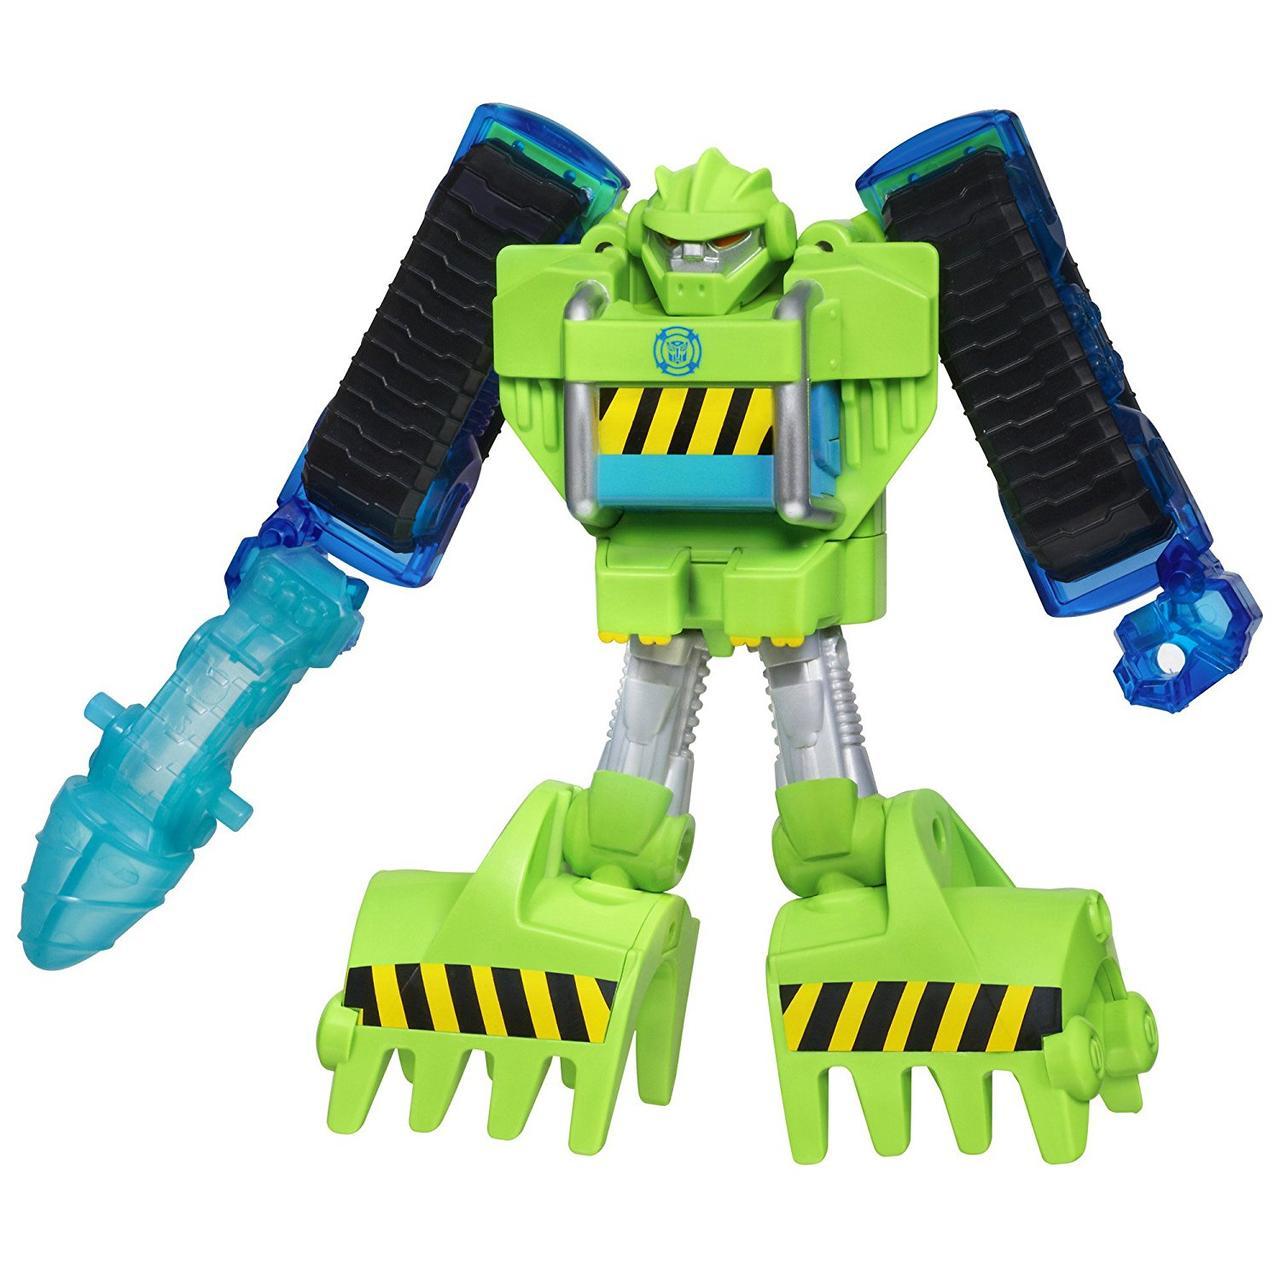 Трансформер Боты Спасатели Болдер Playskool Heroes Transformers Rescue Bots Energize Boulder the Construction-